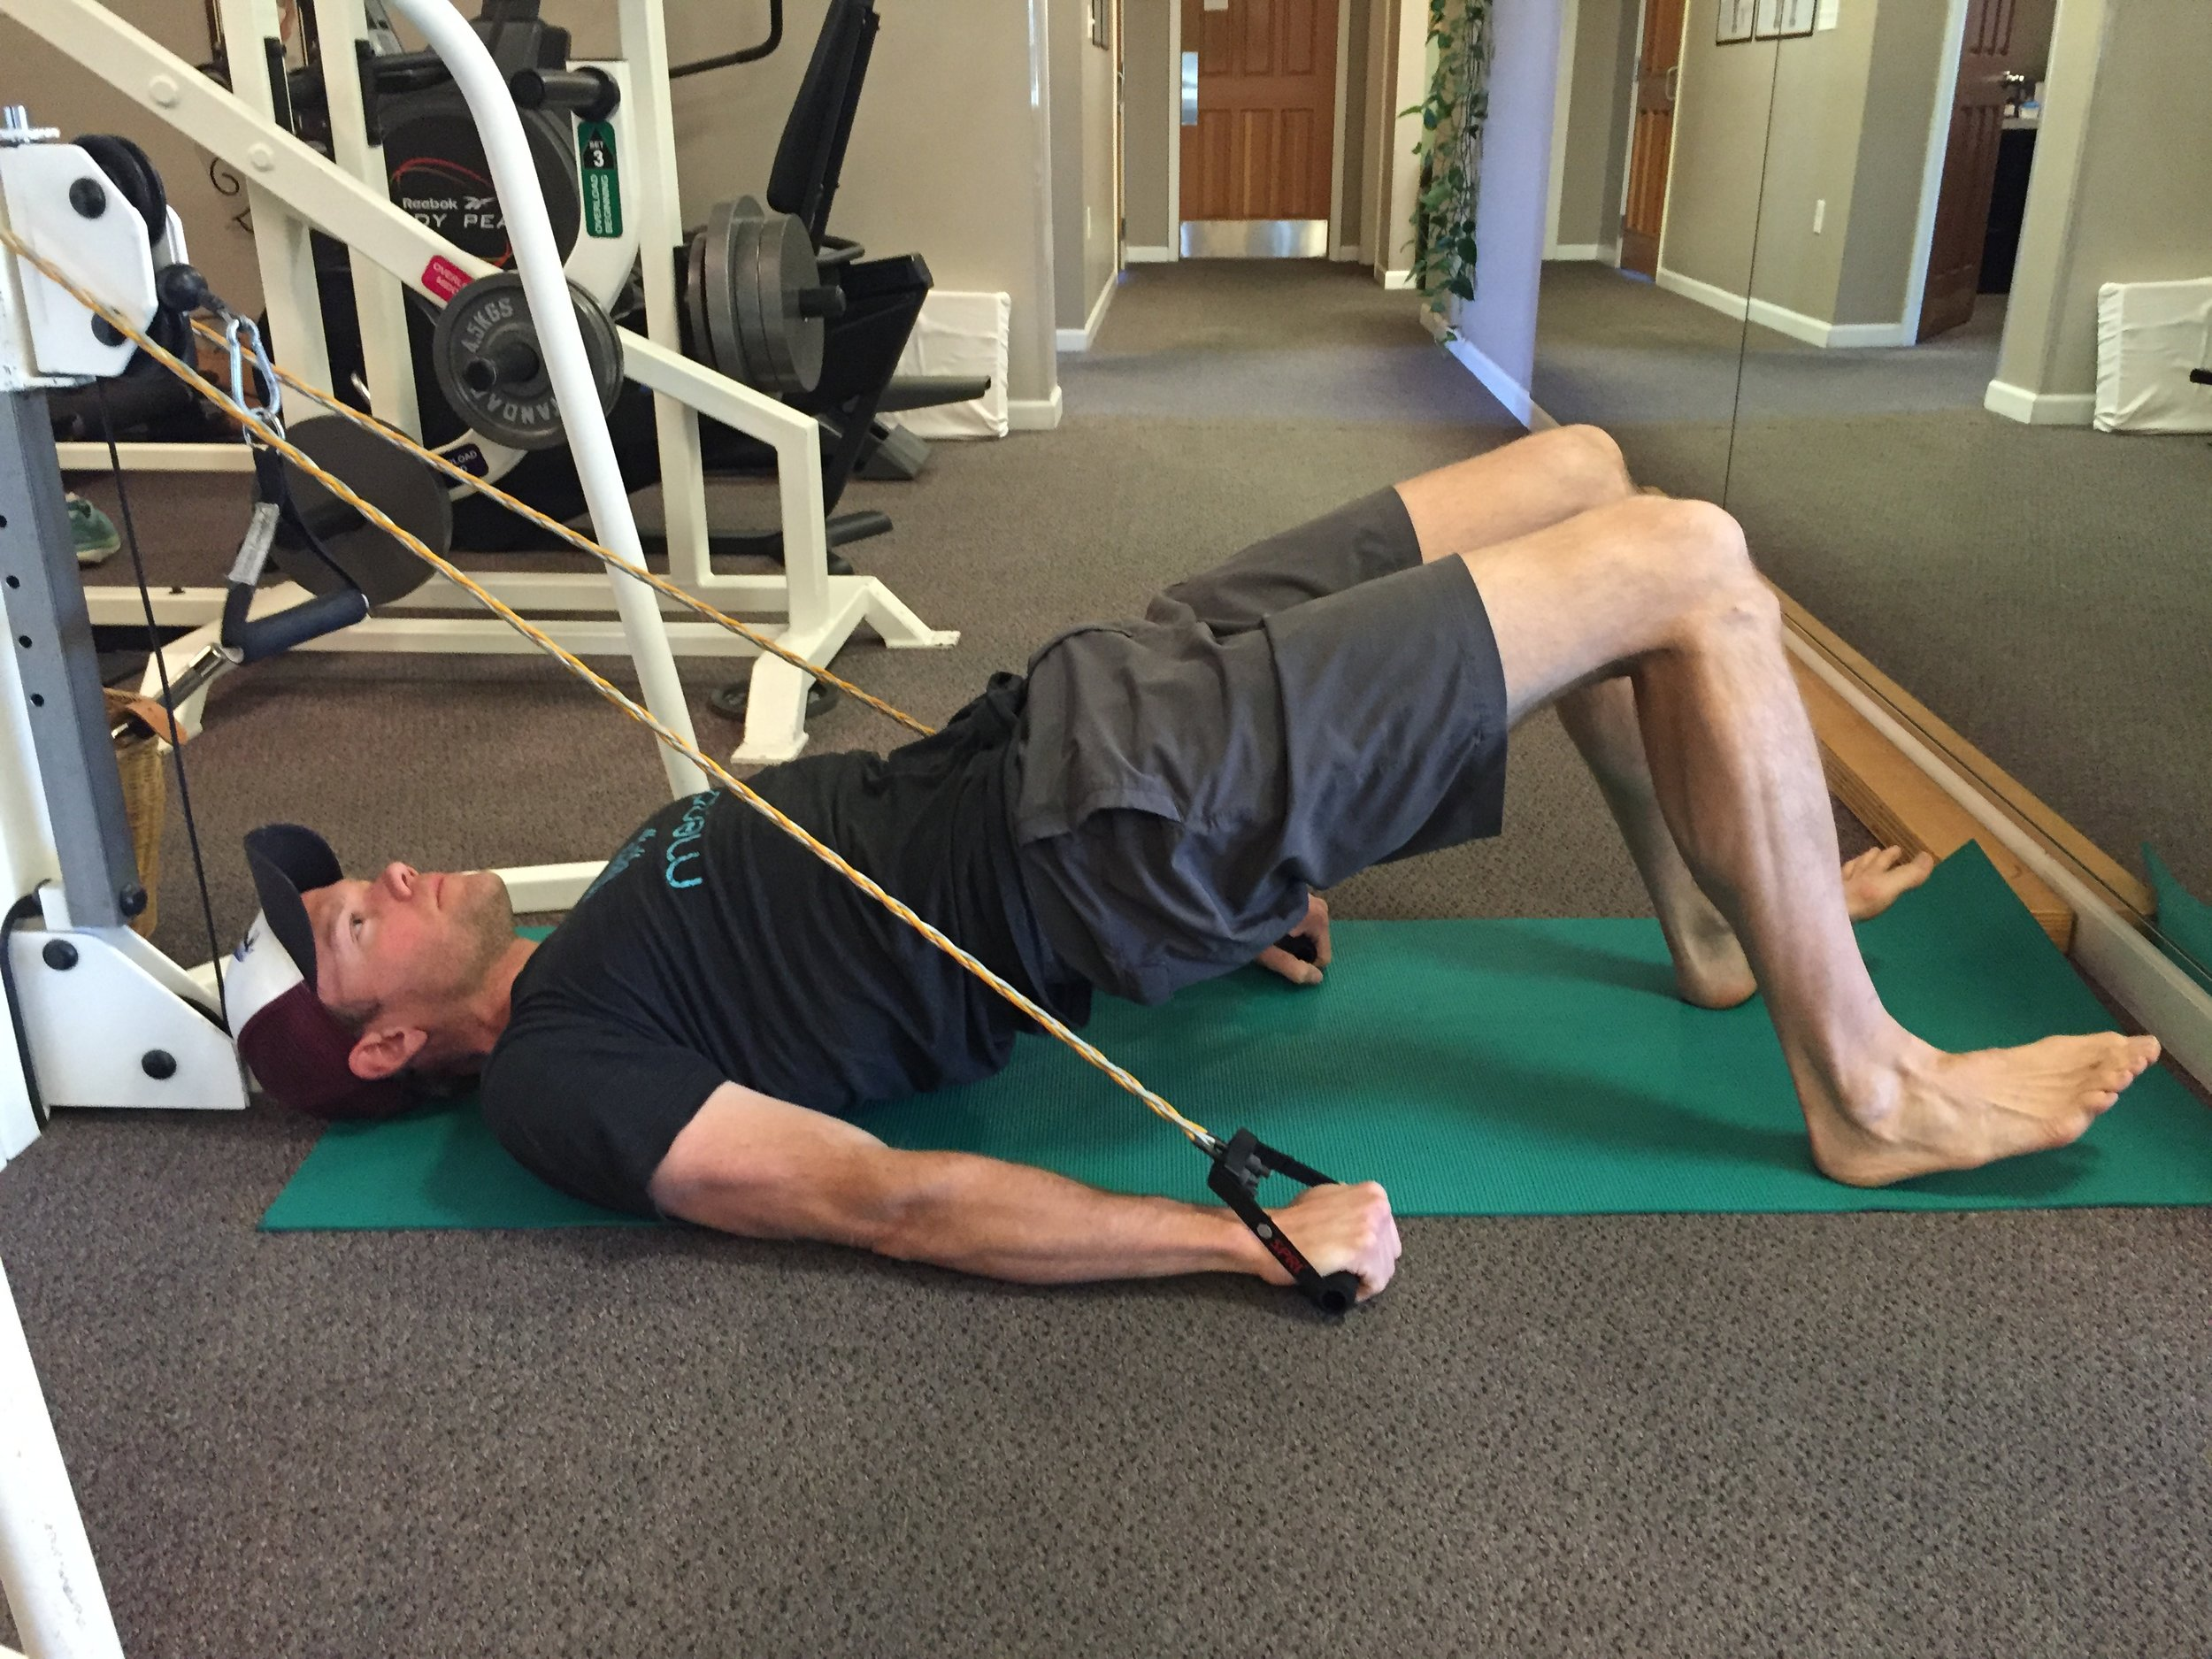 swimming-strengthening-shoulder-injury-prevention